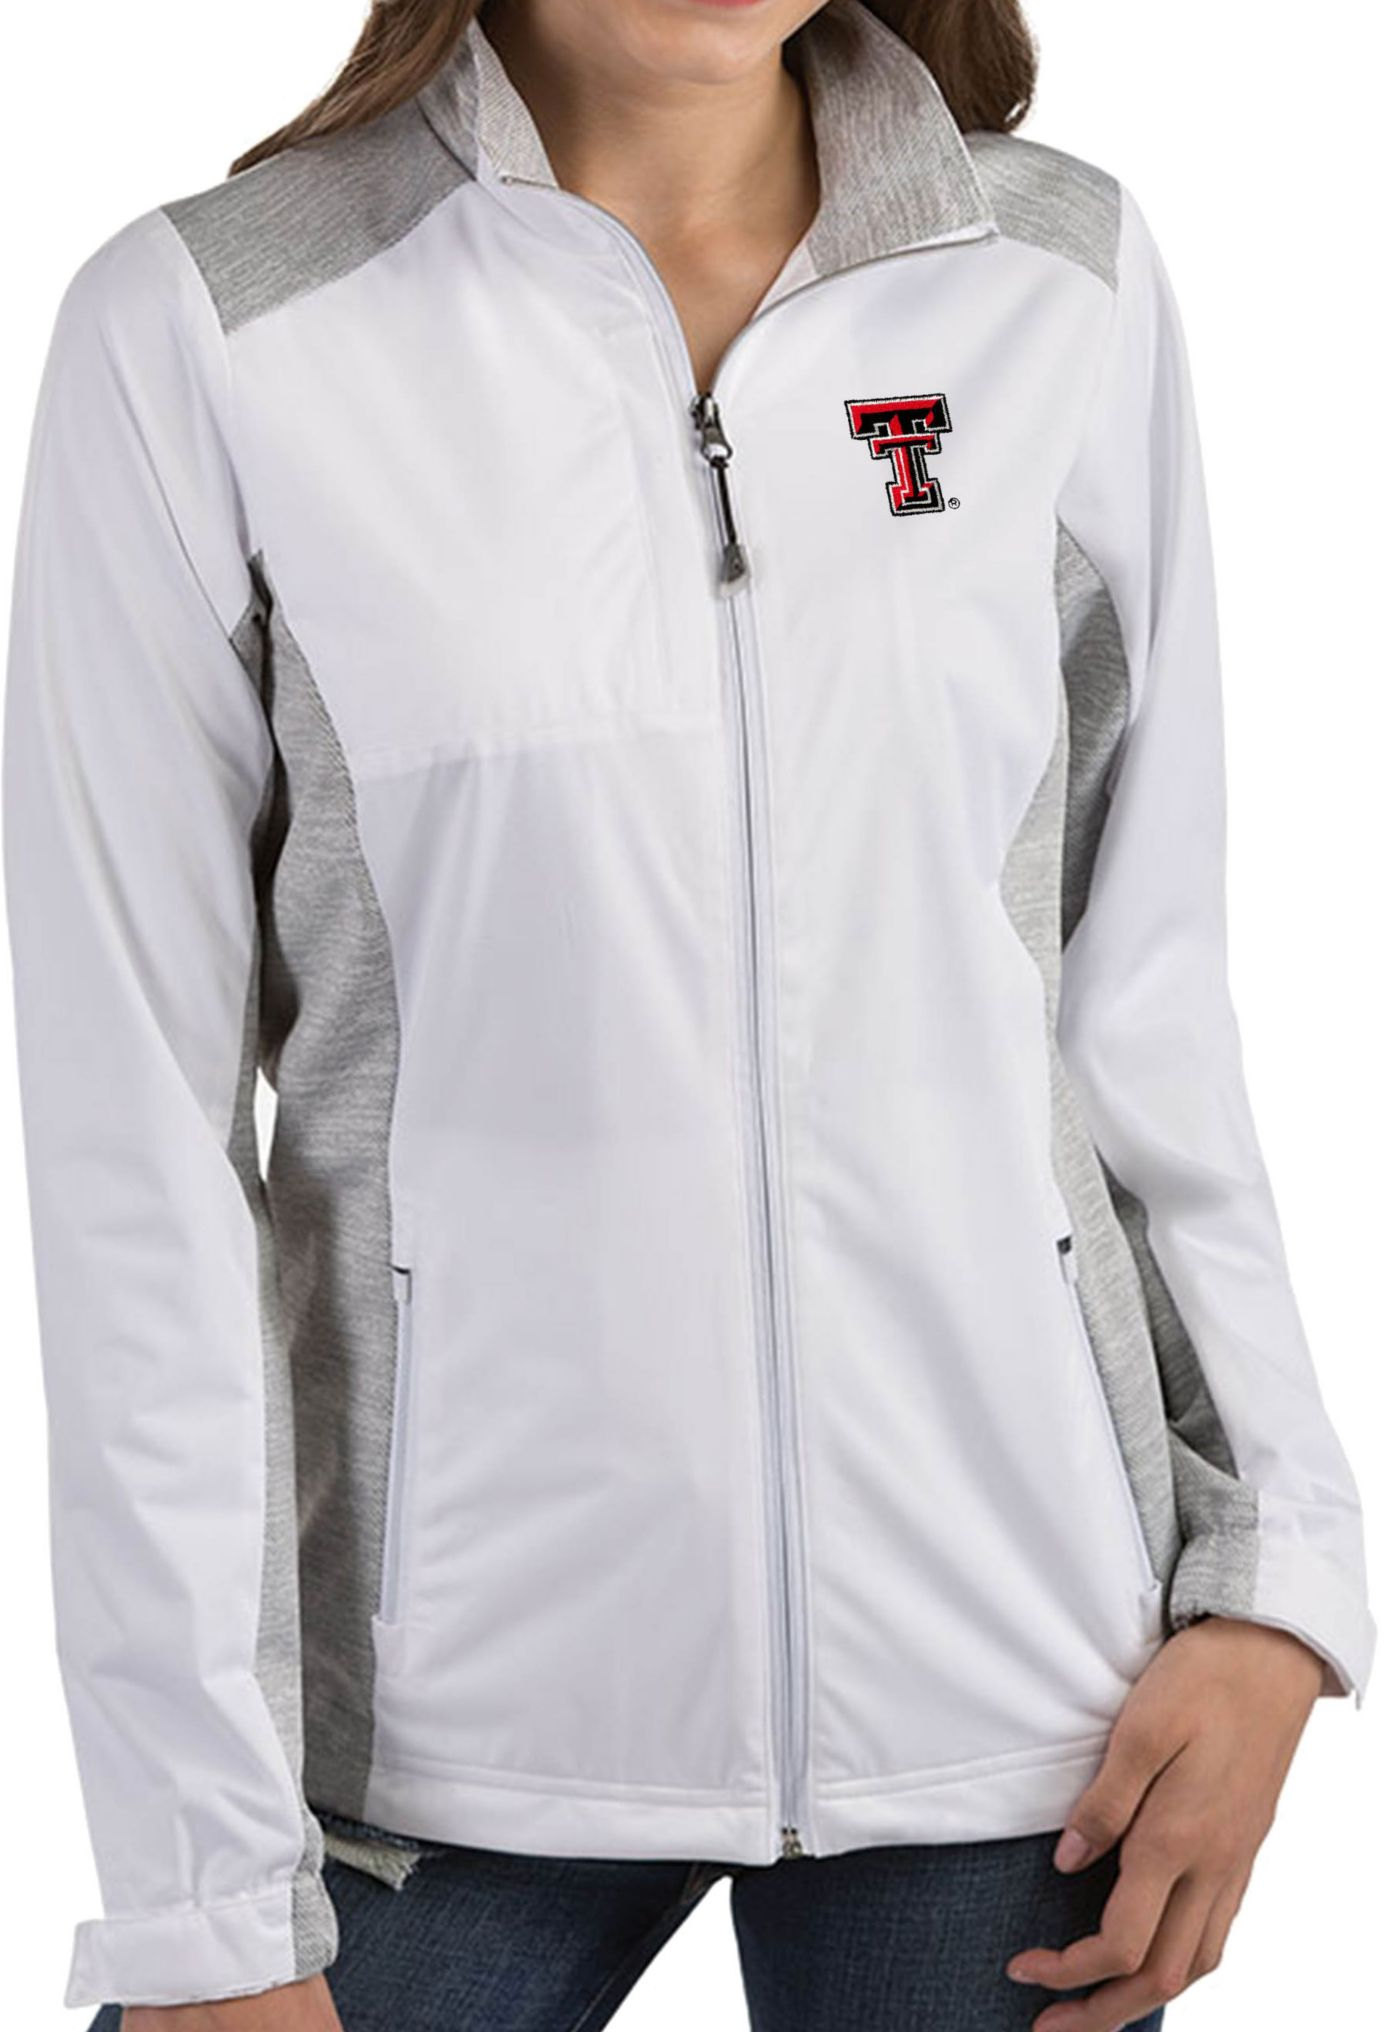 Antigua Women's Texas Tech Red Raiders Revolve Full-Zip White Jacket